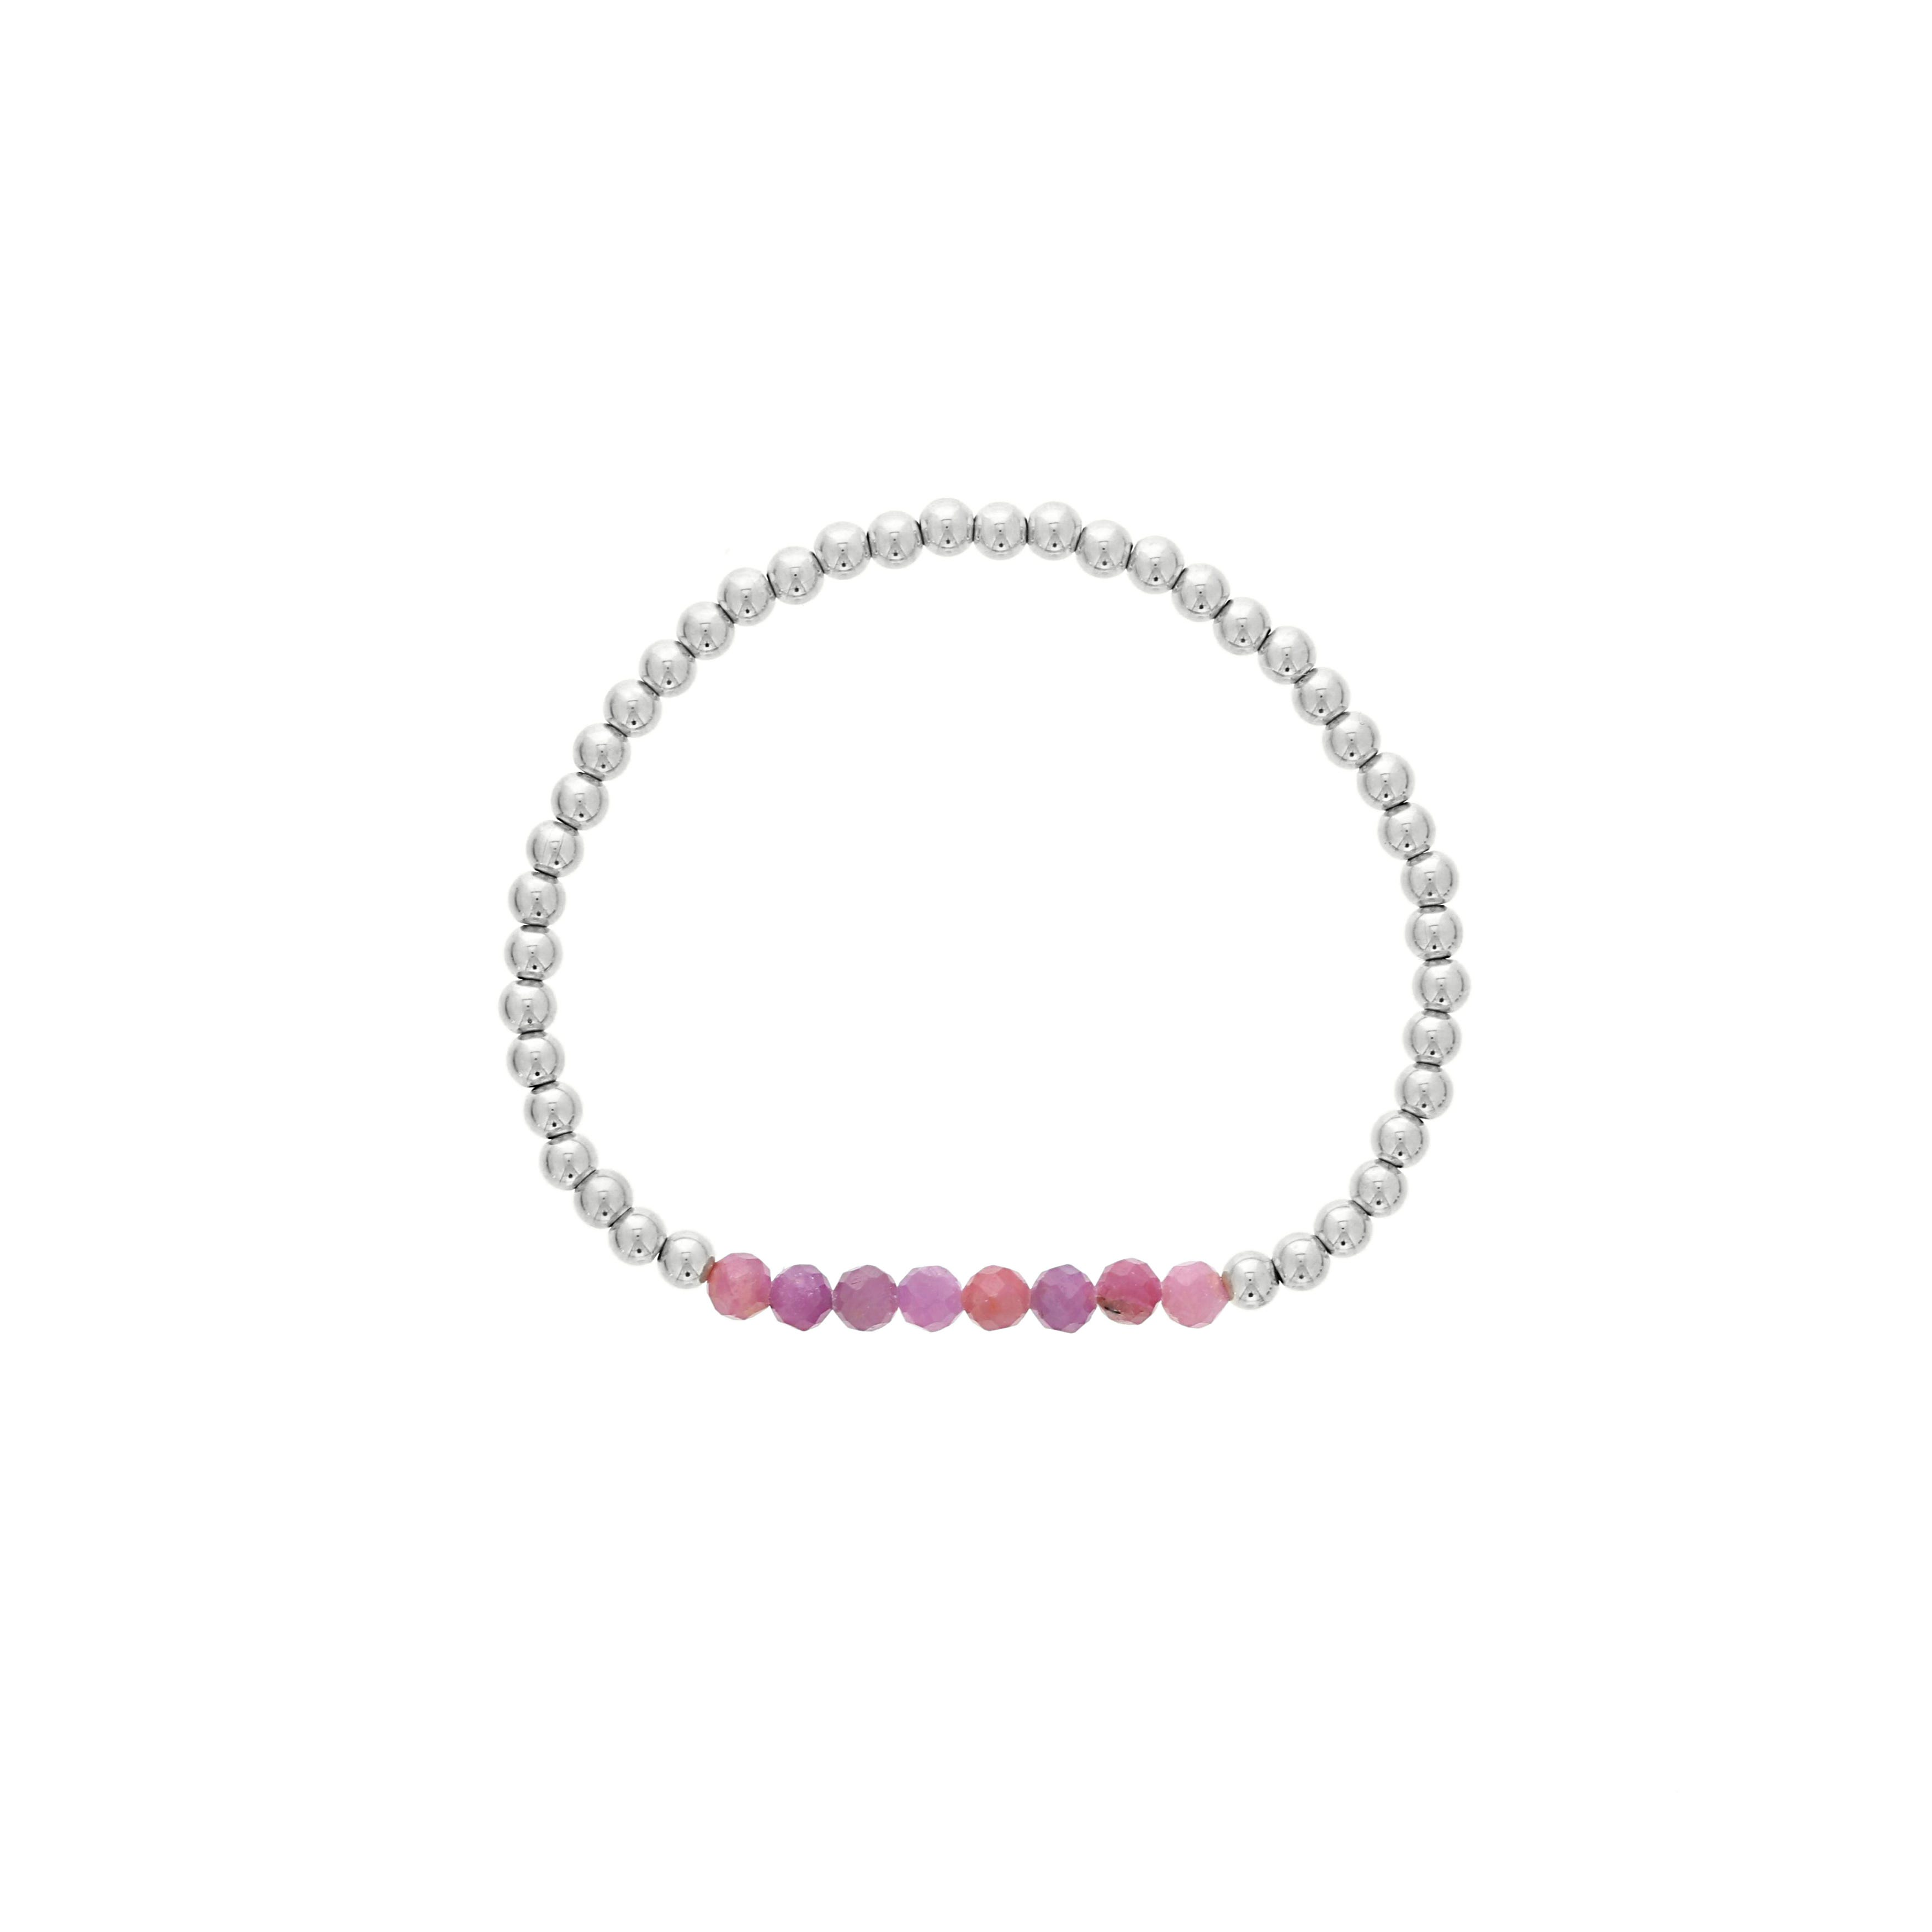 Ruby Birthstone Beaded Bracelet in Sterling Silver